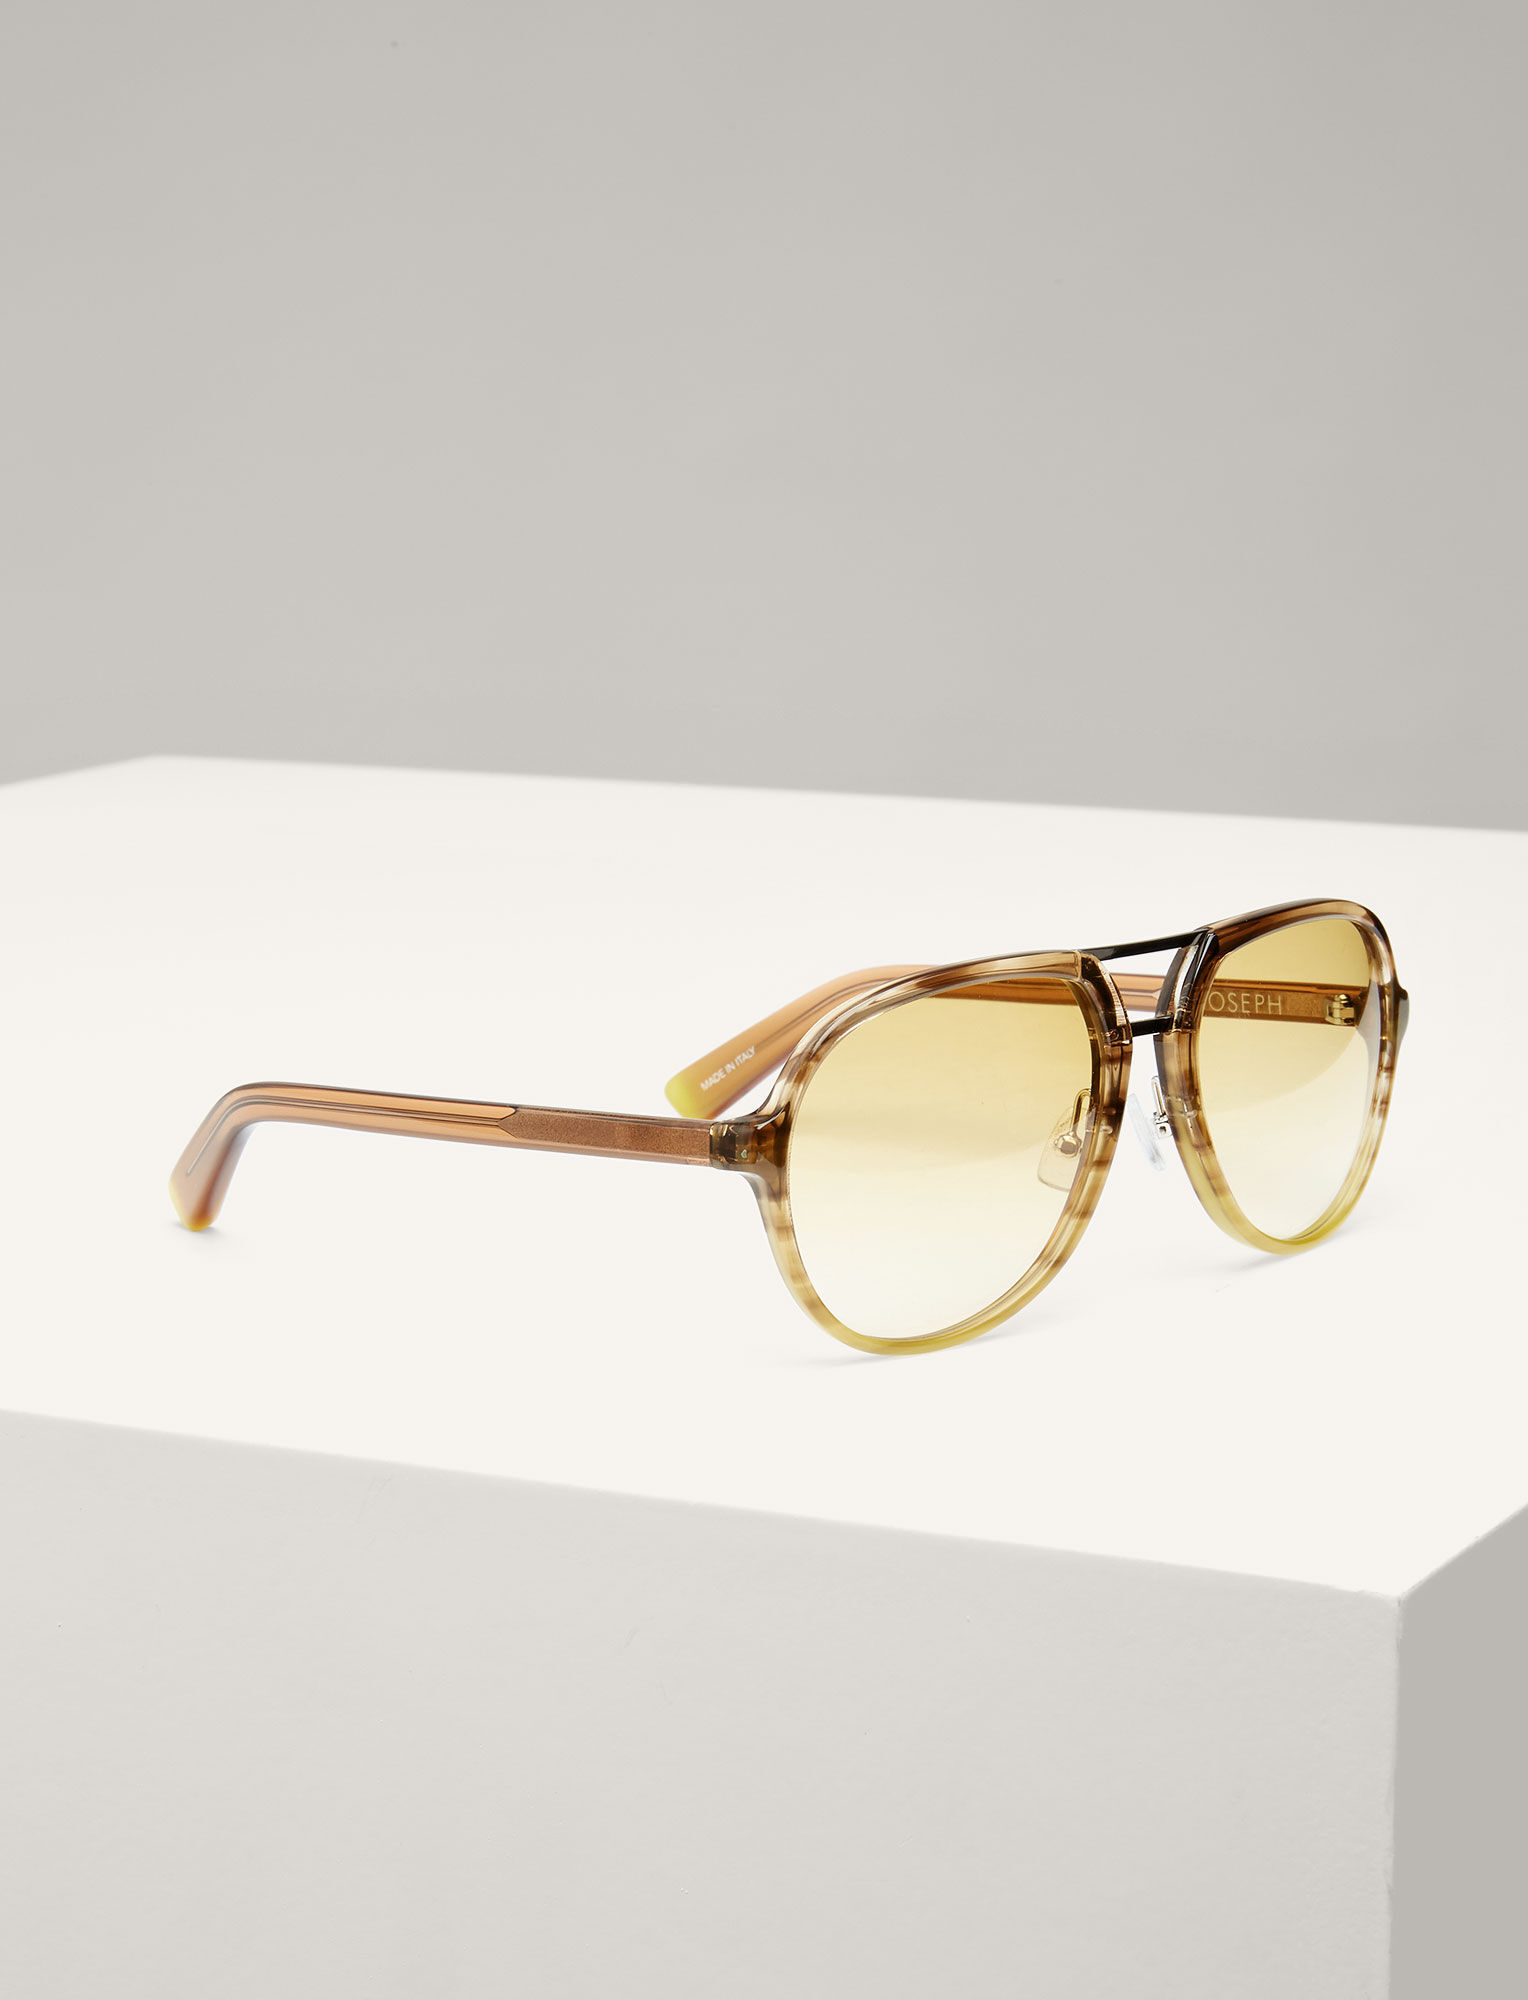 Joseph, Duke Sunglasses, in GOLD